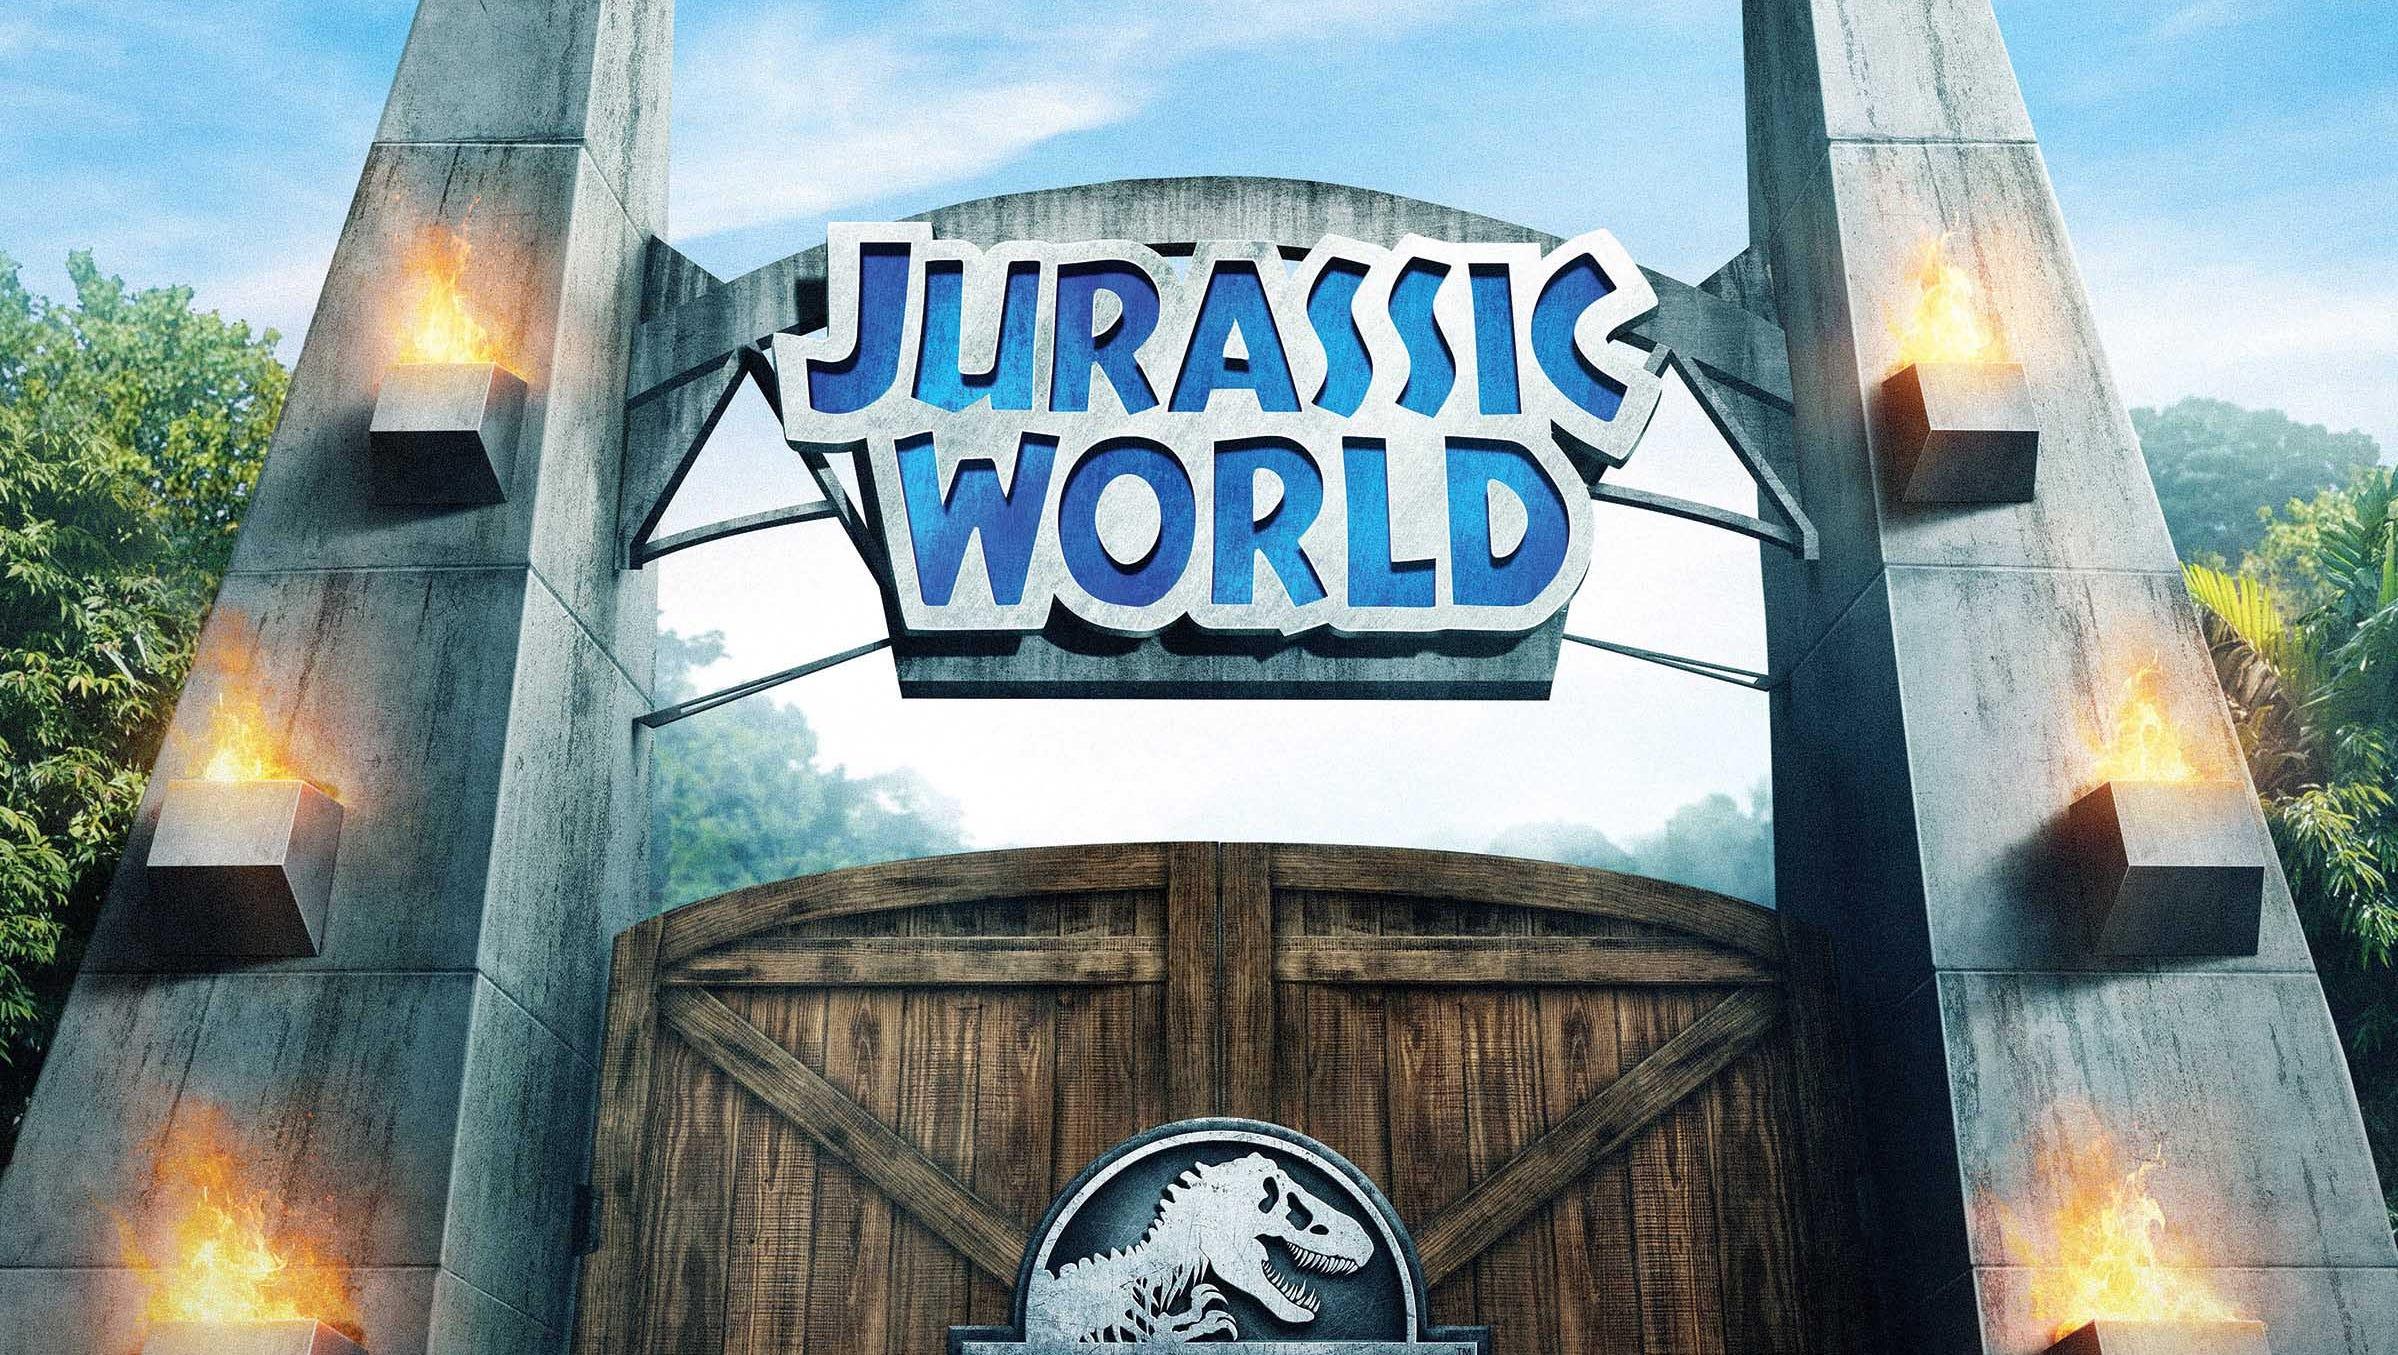 'Jurassic World' ride evolves from 'Jurassic Park' at ...